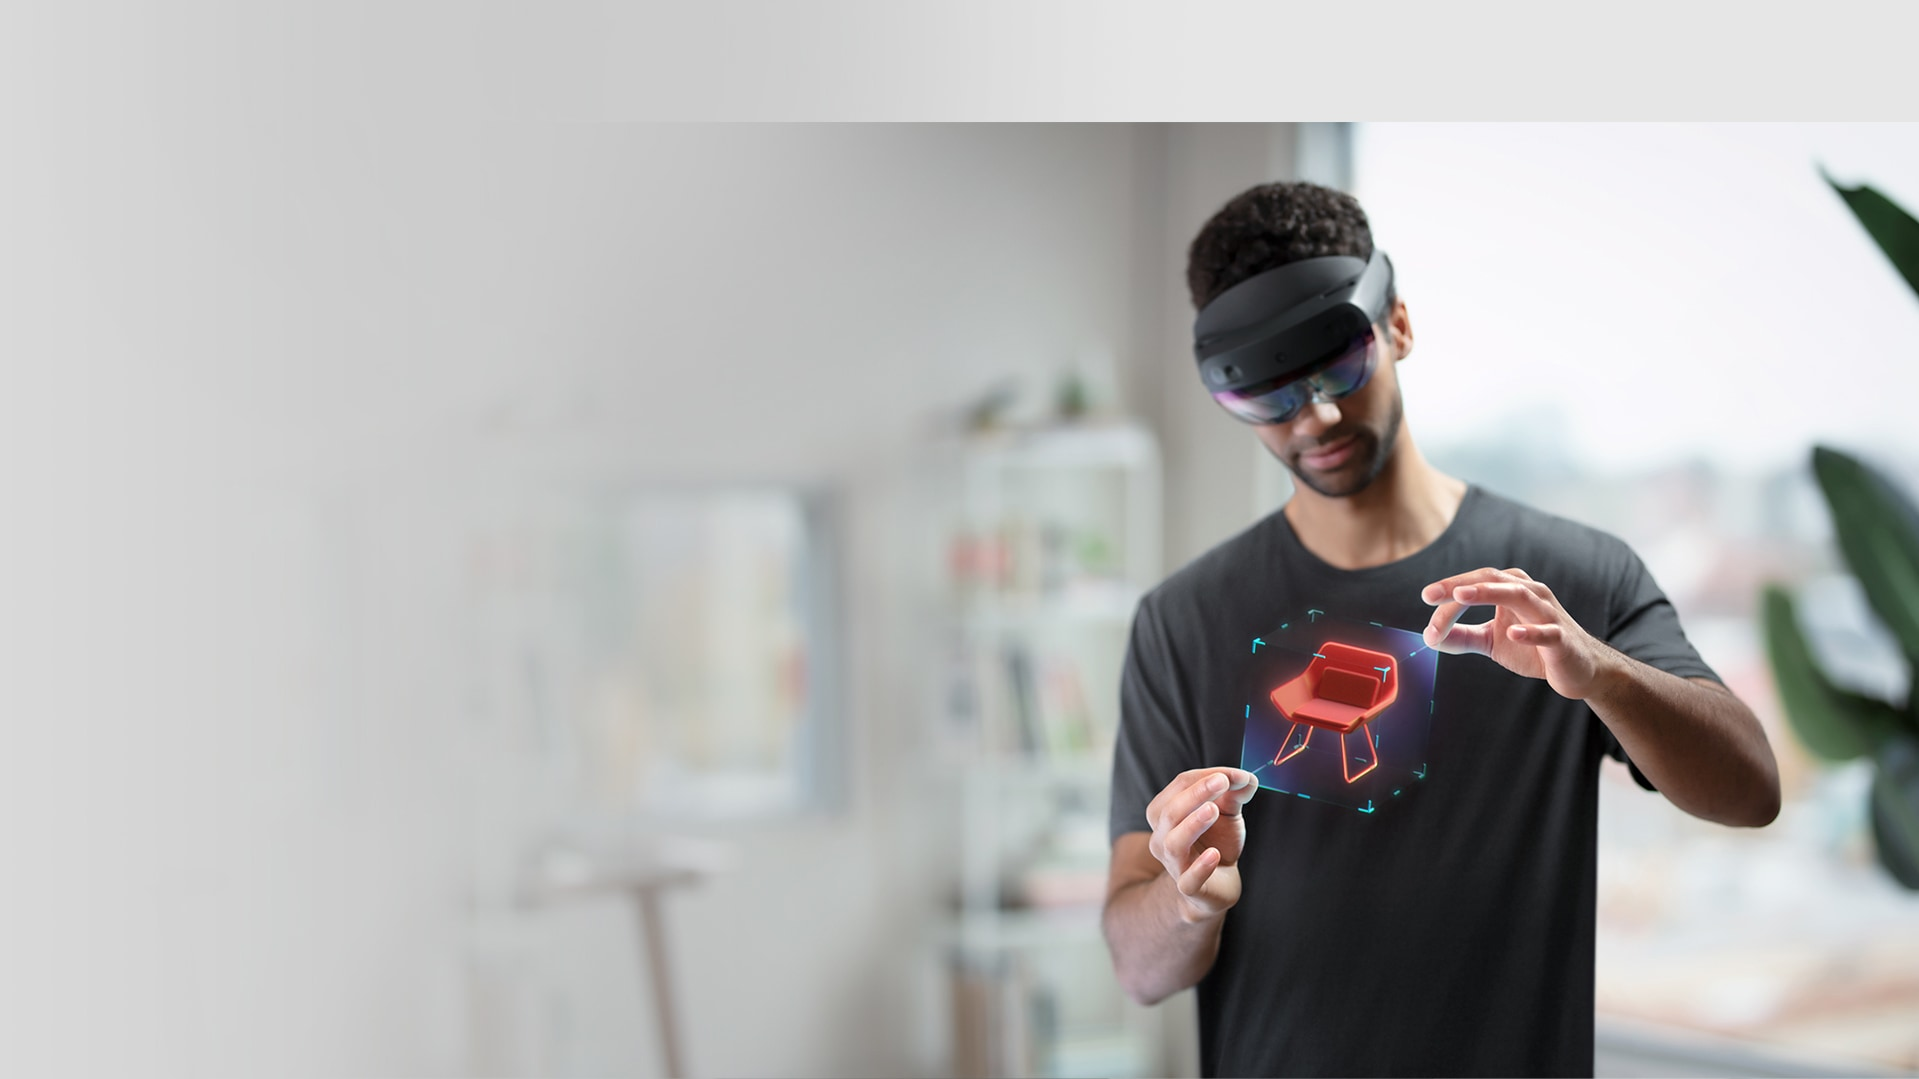 Developer using a HoloLens 2 device